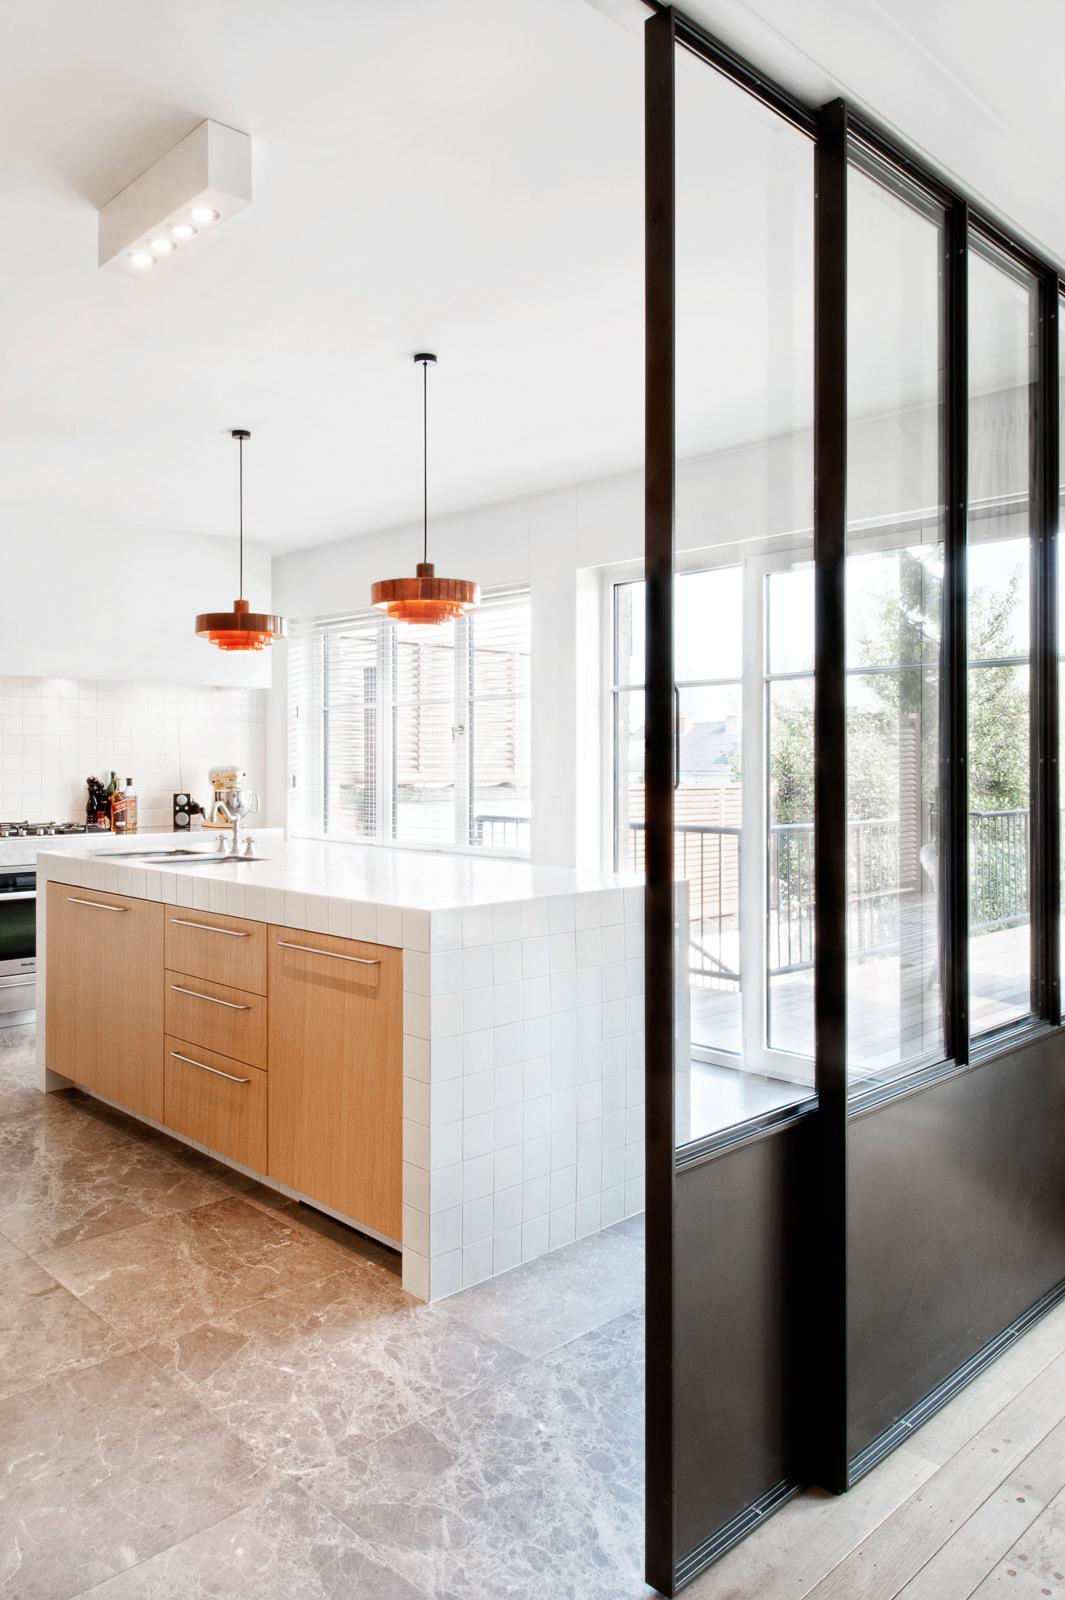 Keuken fotografie Patricia De Rycke